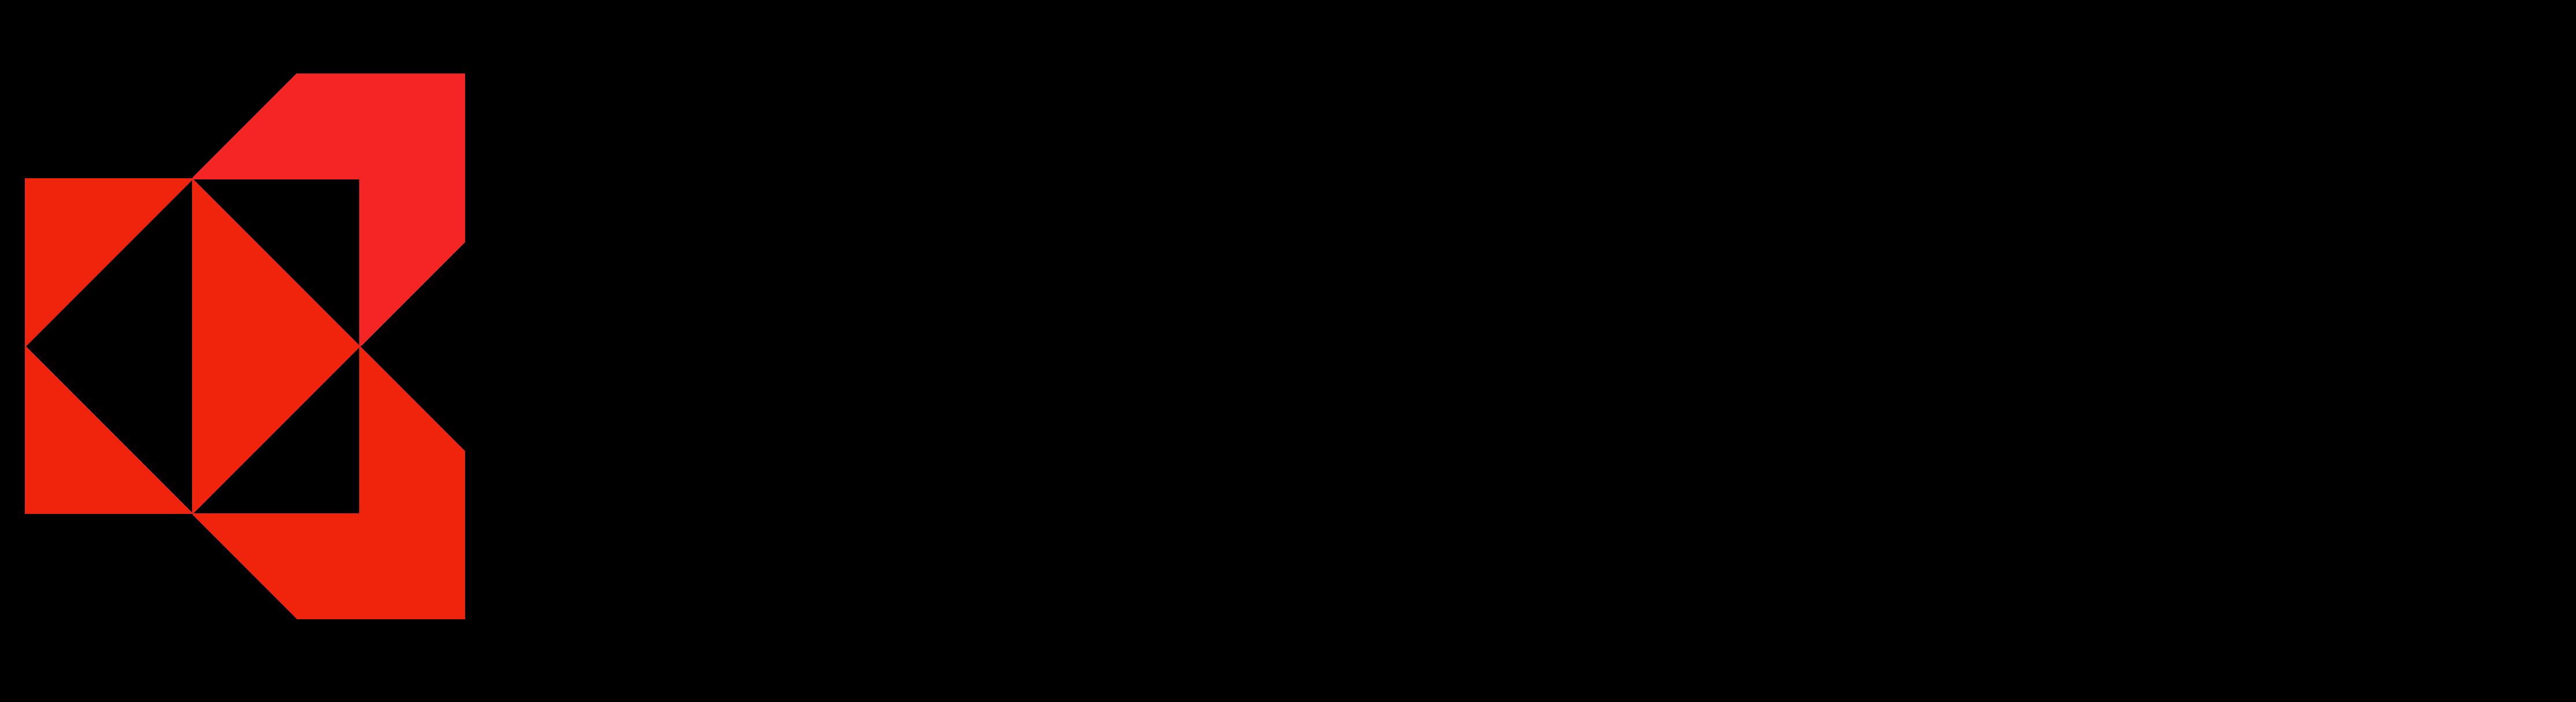 Kyocera logo, logotype - Kyocera Vector Logo PNG - Kyocera Logo PNG